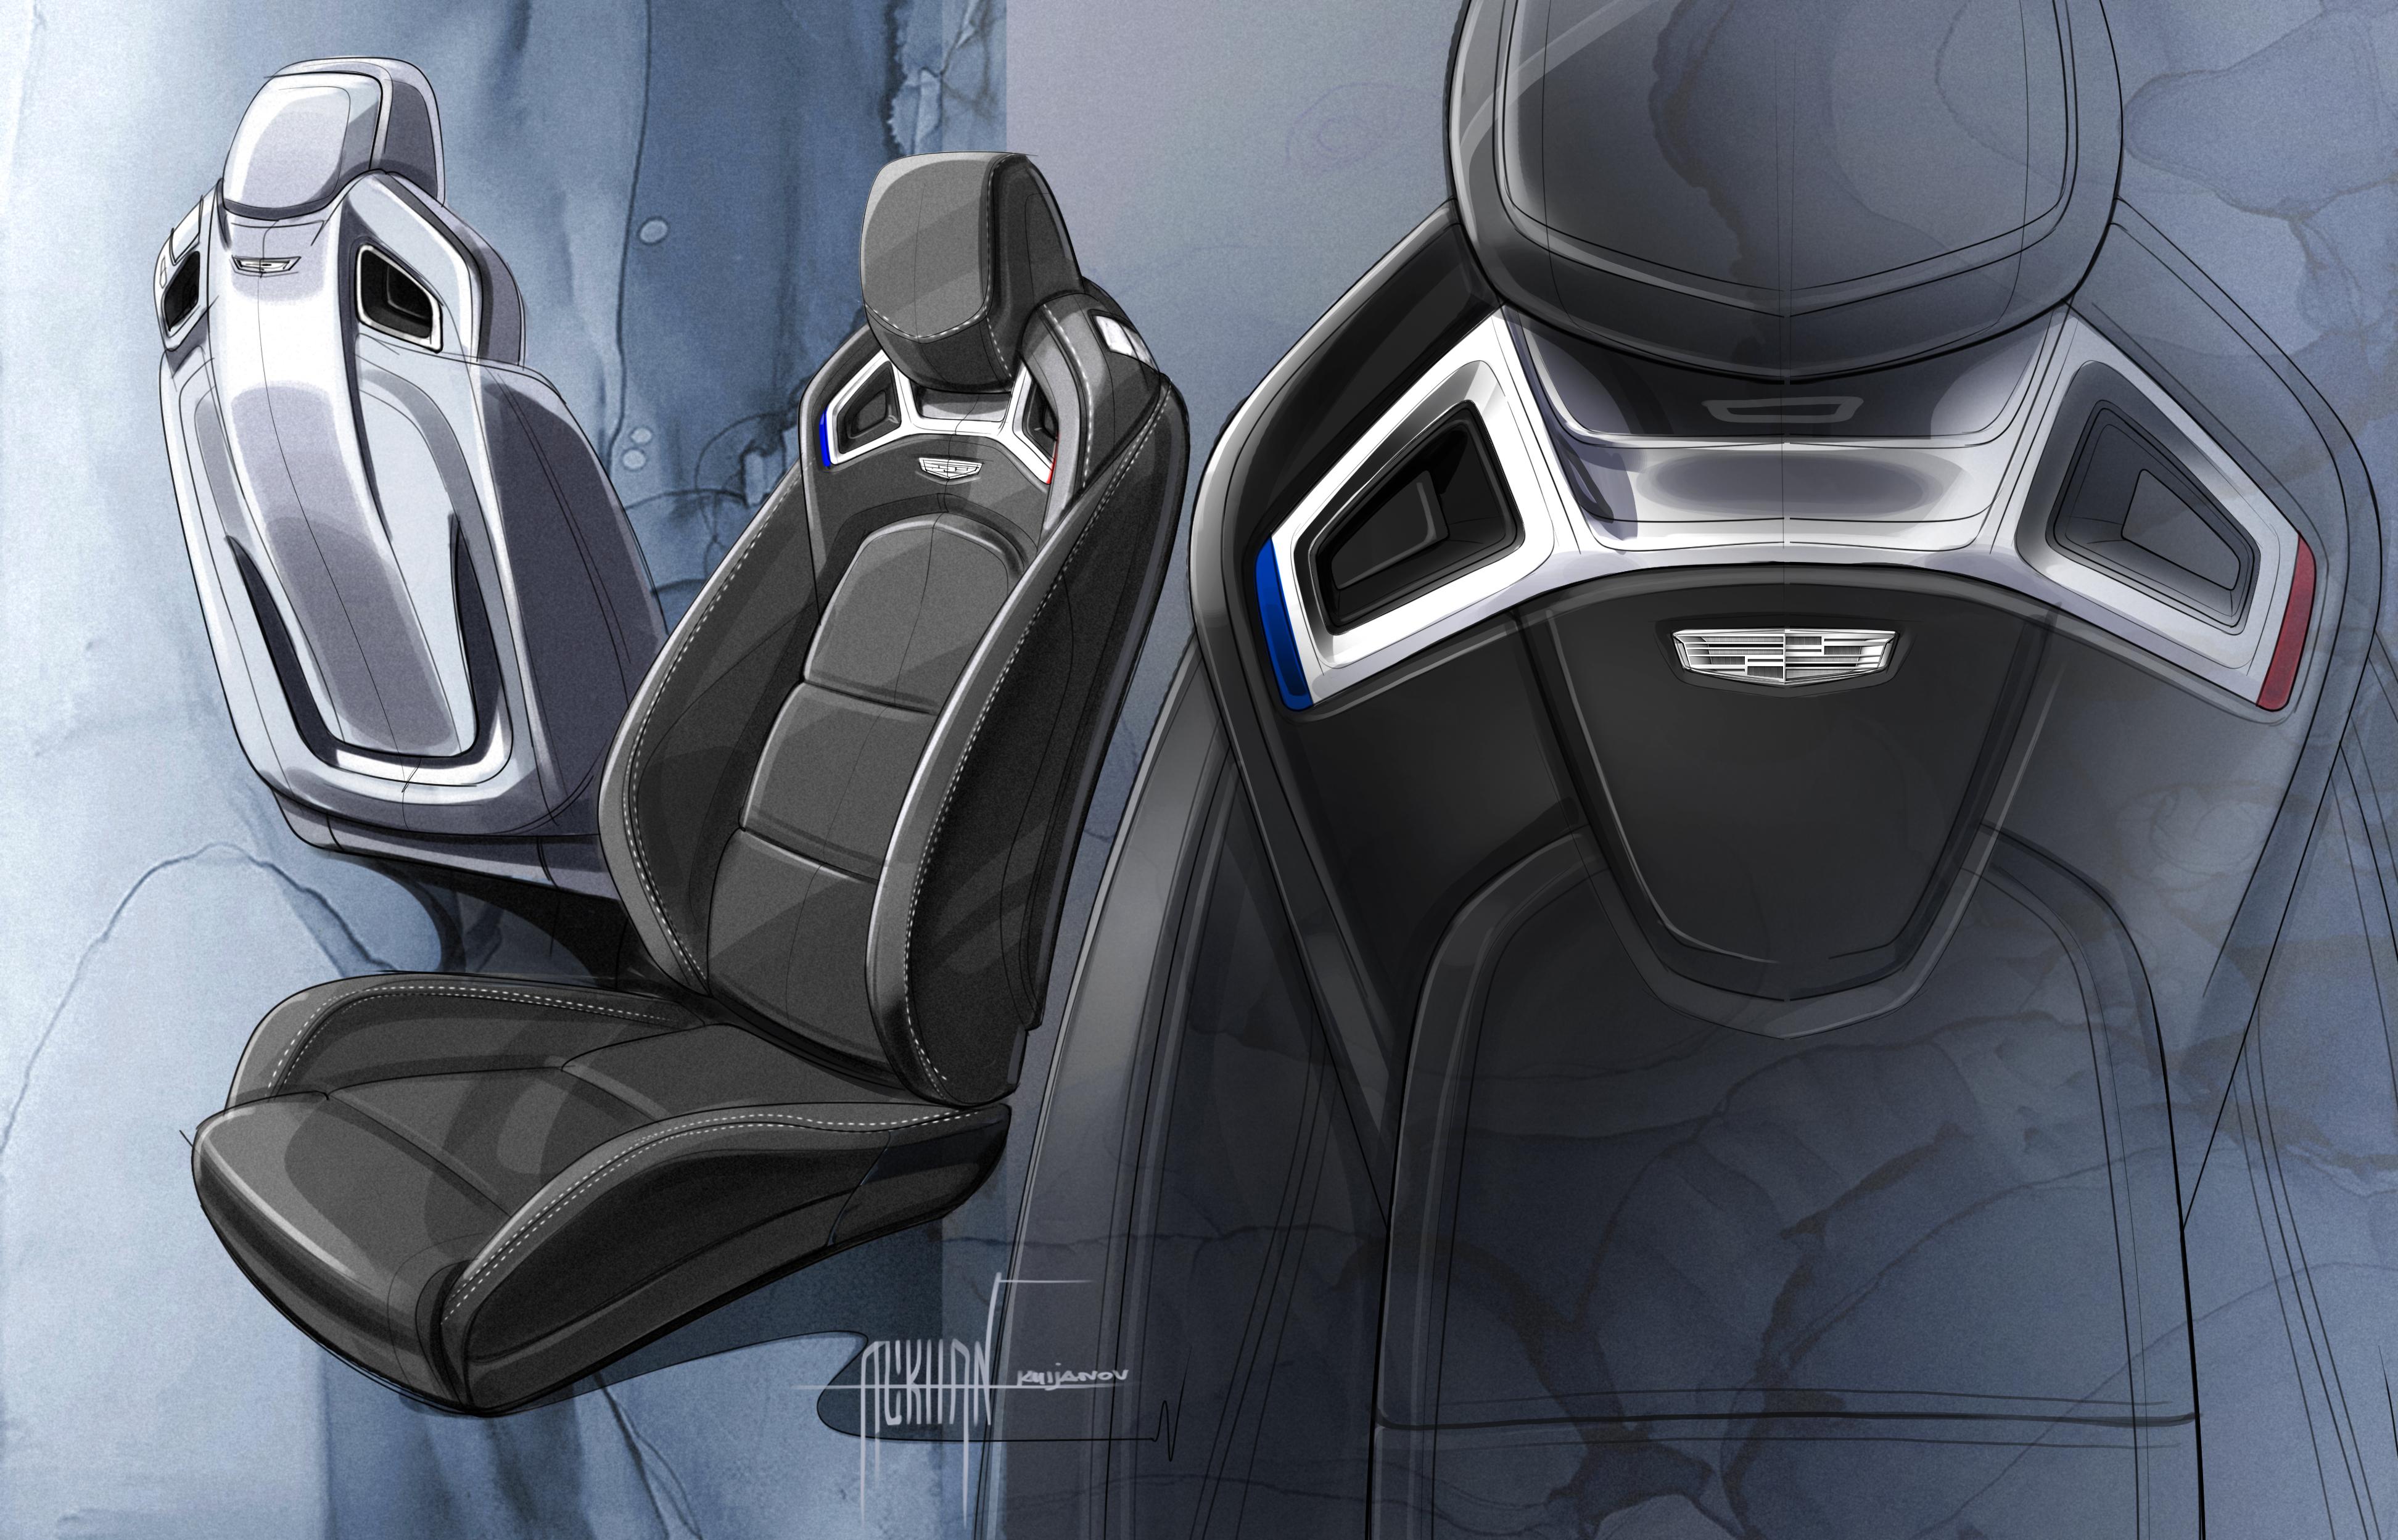 Cadillac S Racing Inspired Recaro Seats Stun